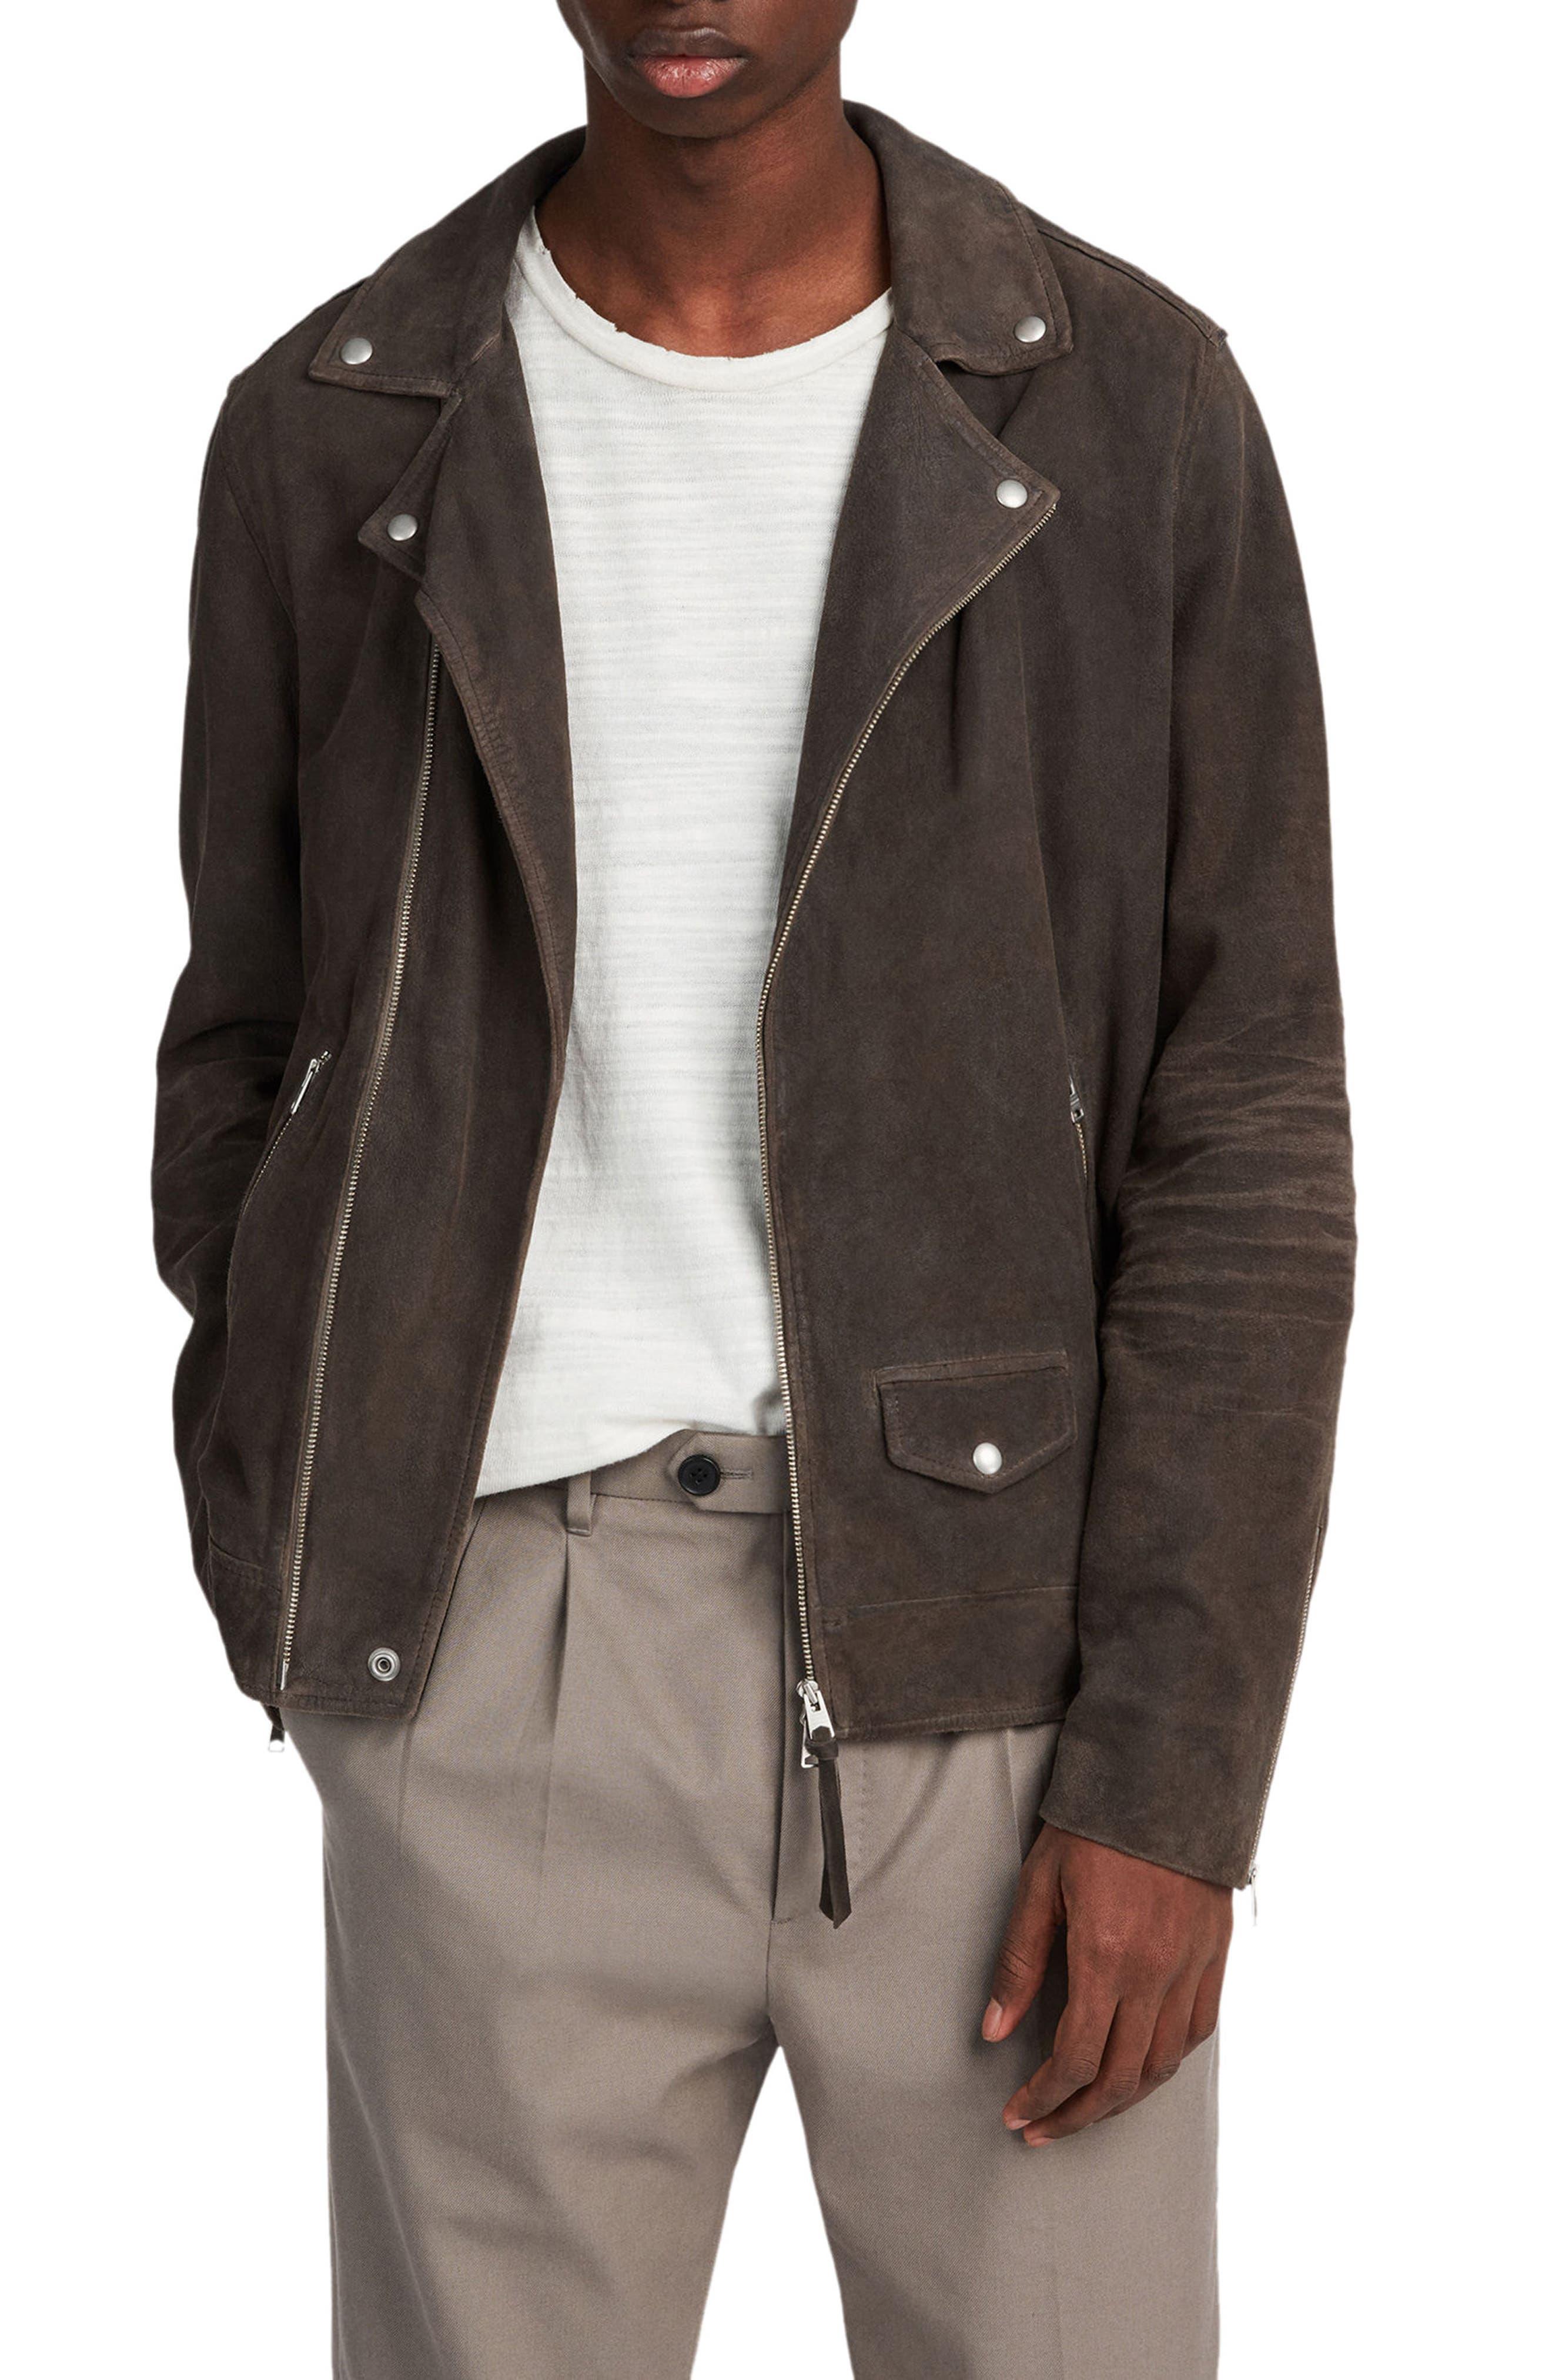 Kano Suede Moto Jacket,                         Main,                         color, GRAVEL